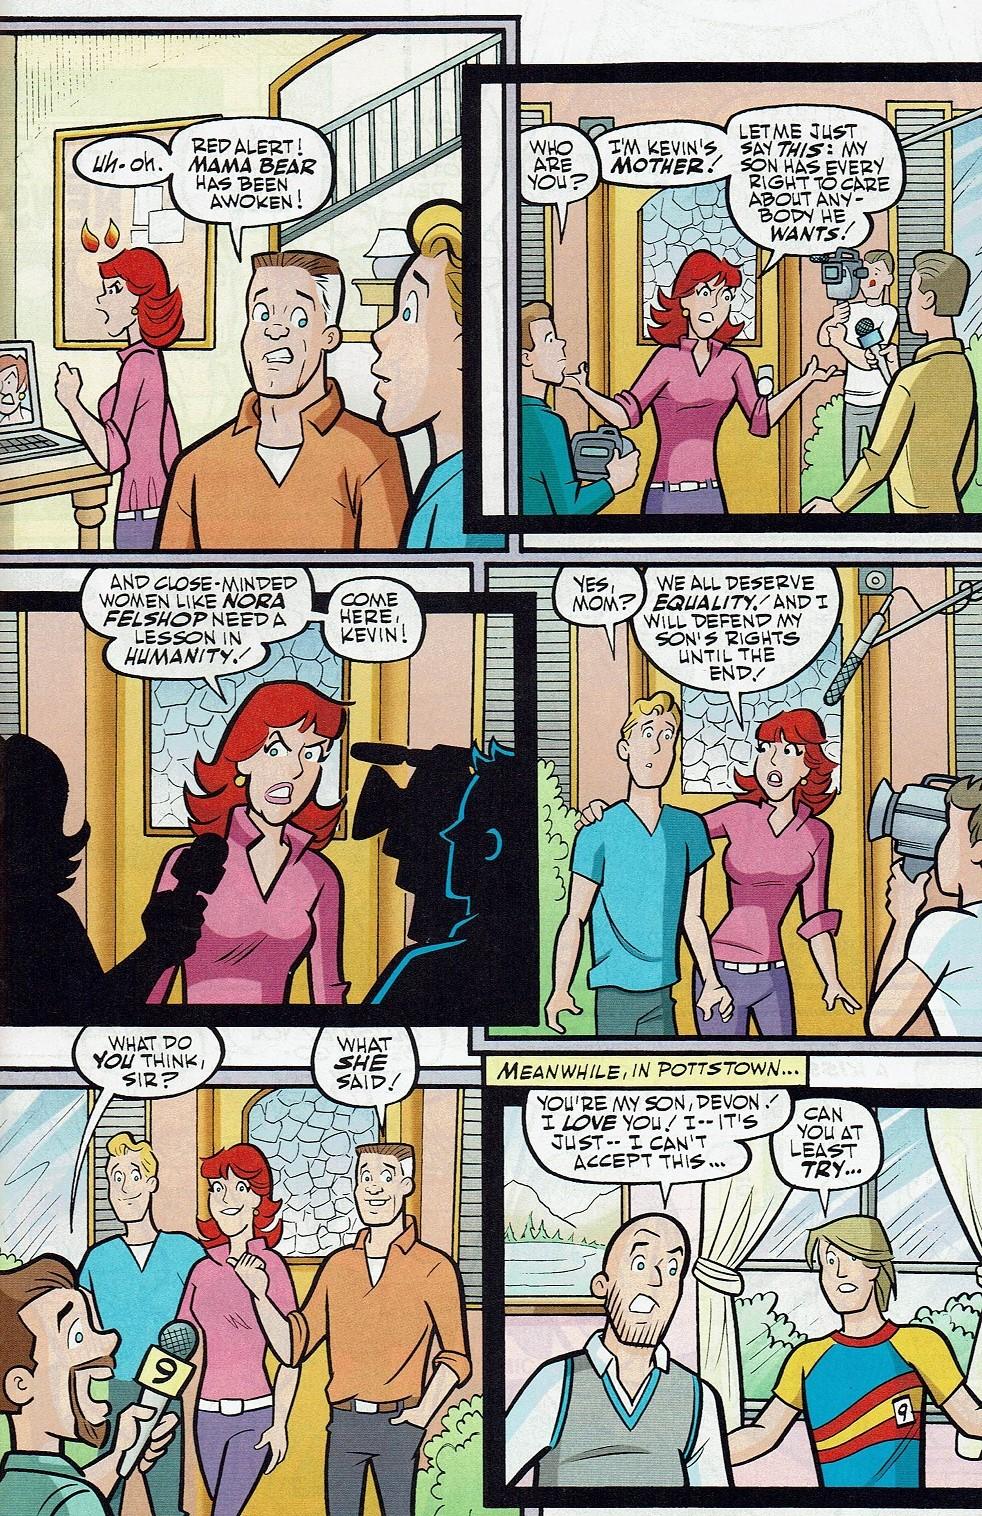 Read online Kevin Keller comic -  Issue #10 - 16